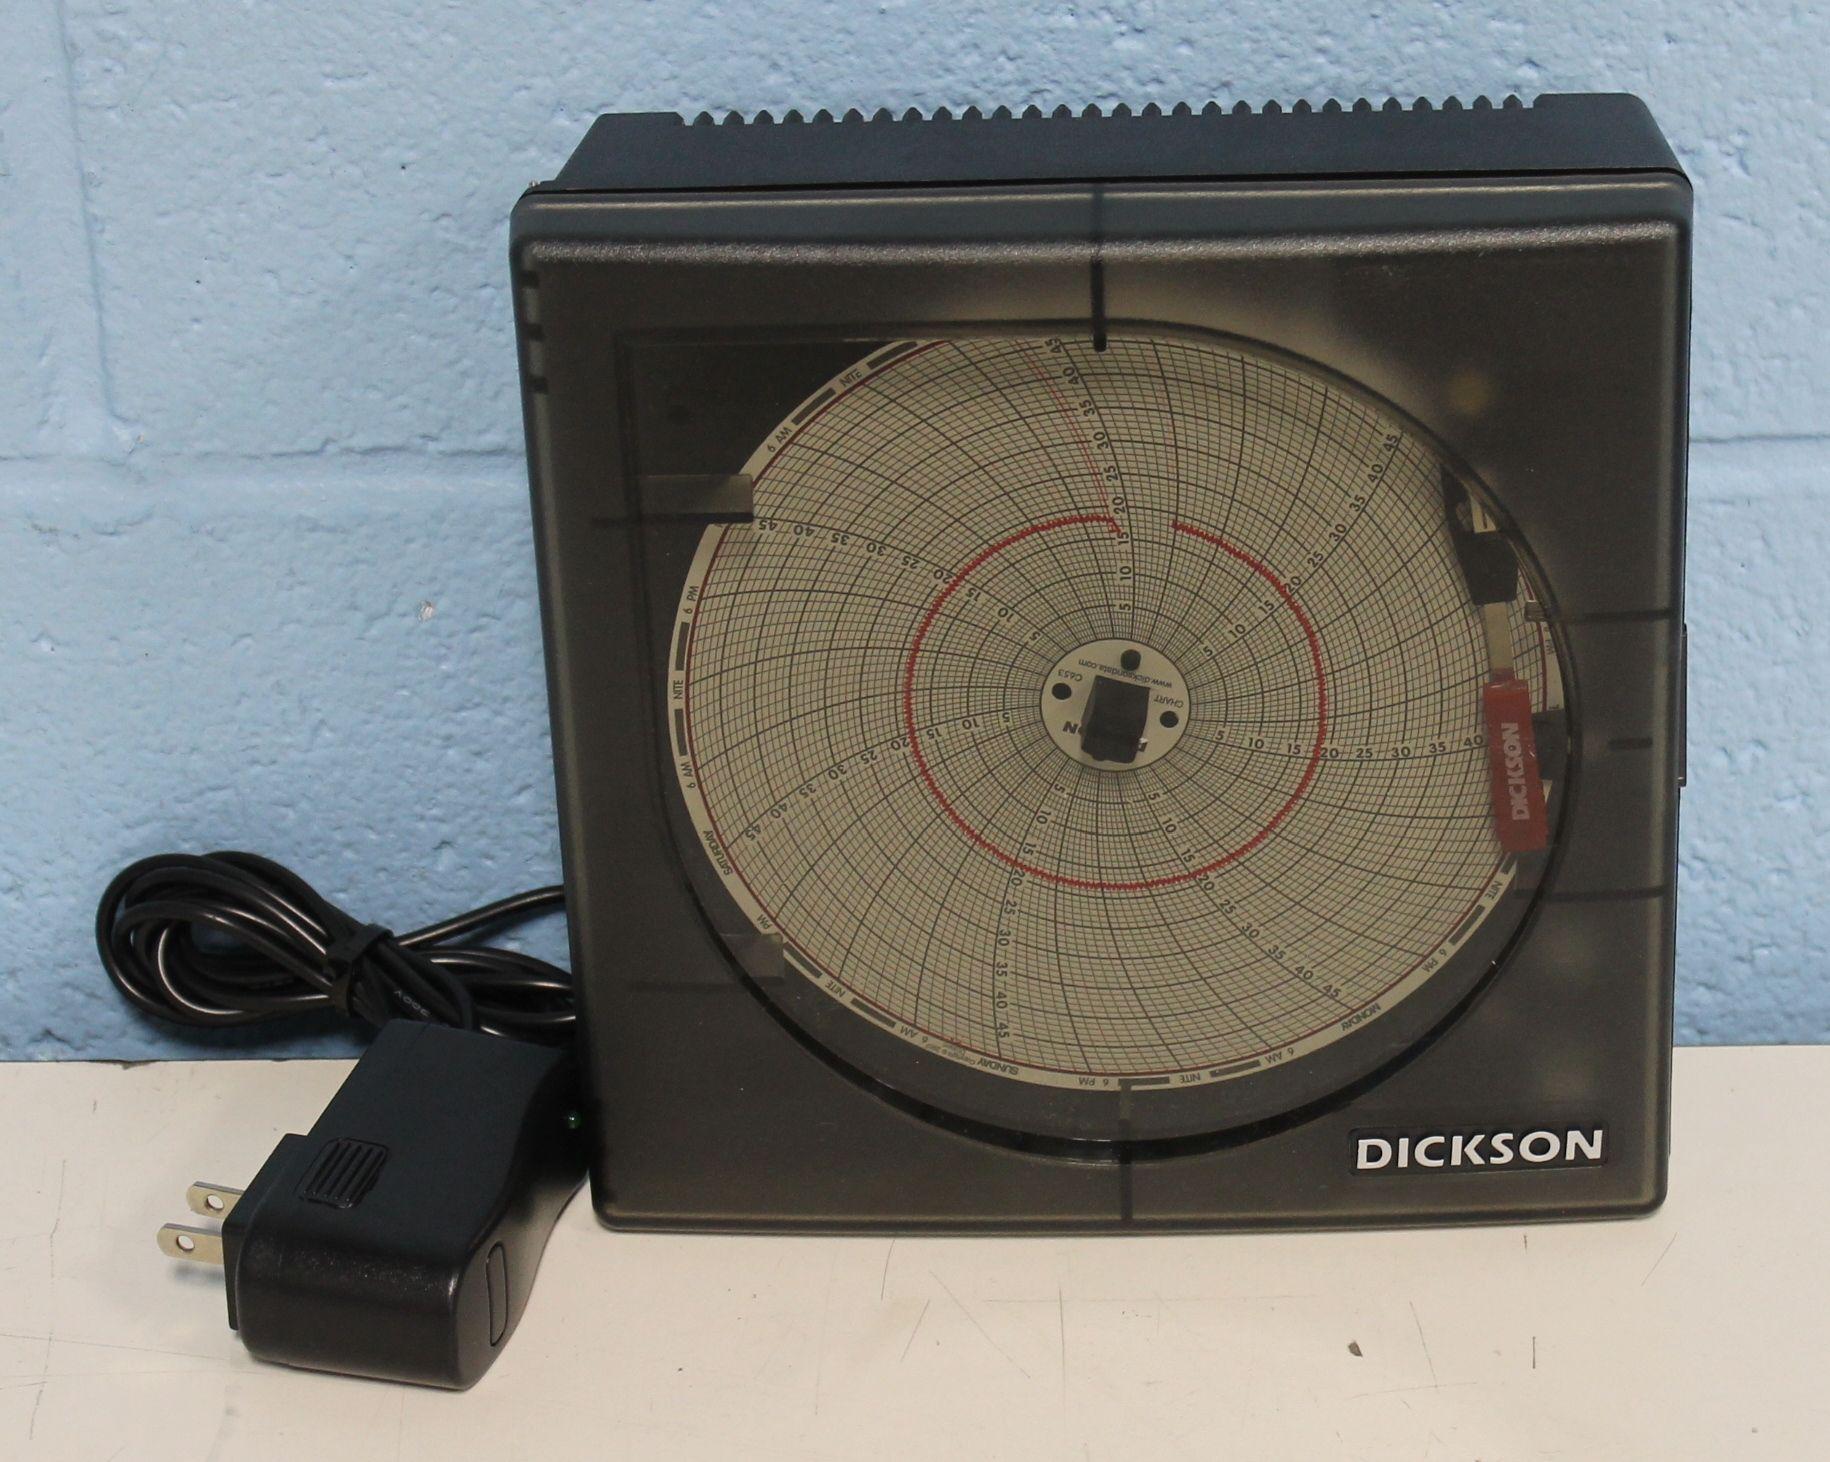 Dickson KT621 6 152mm Temperature Chart Recorder